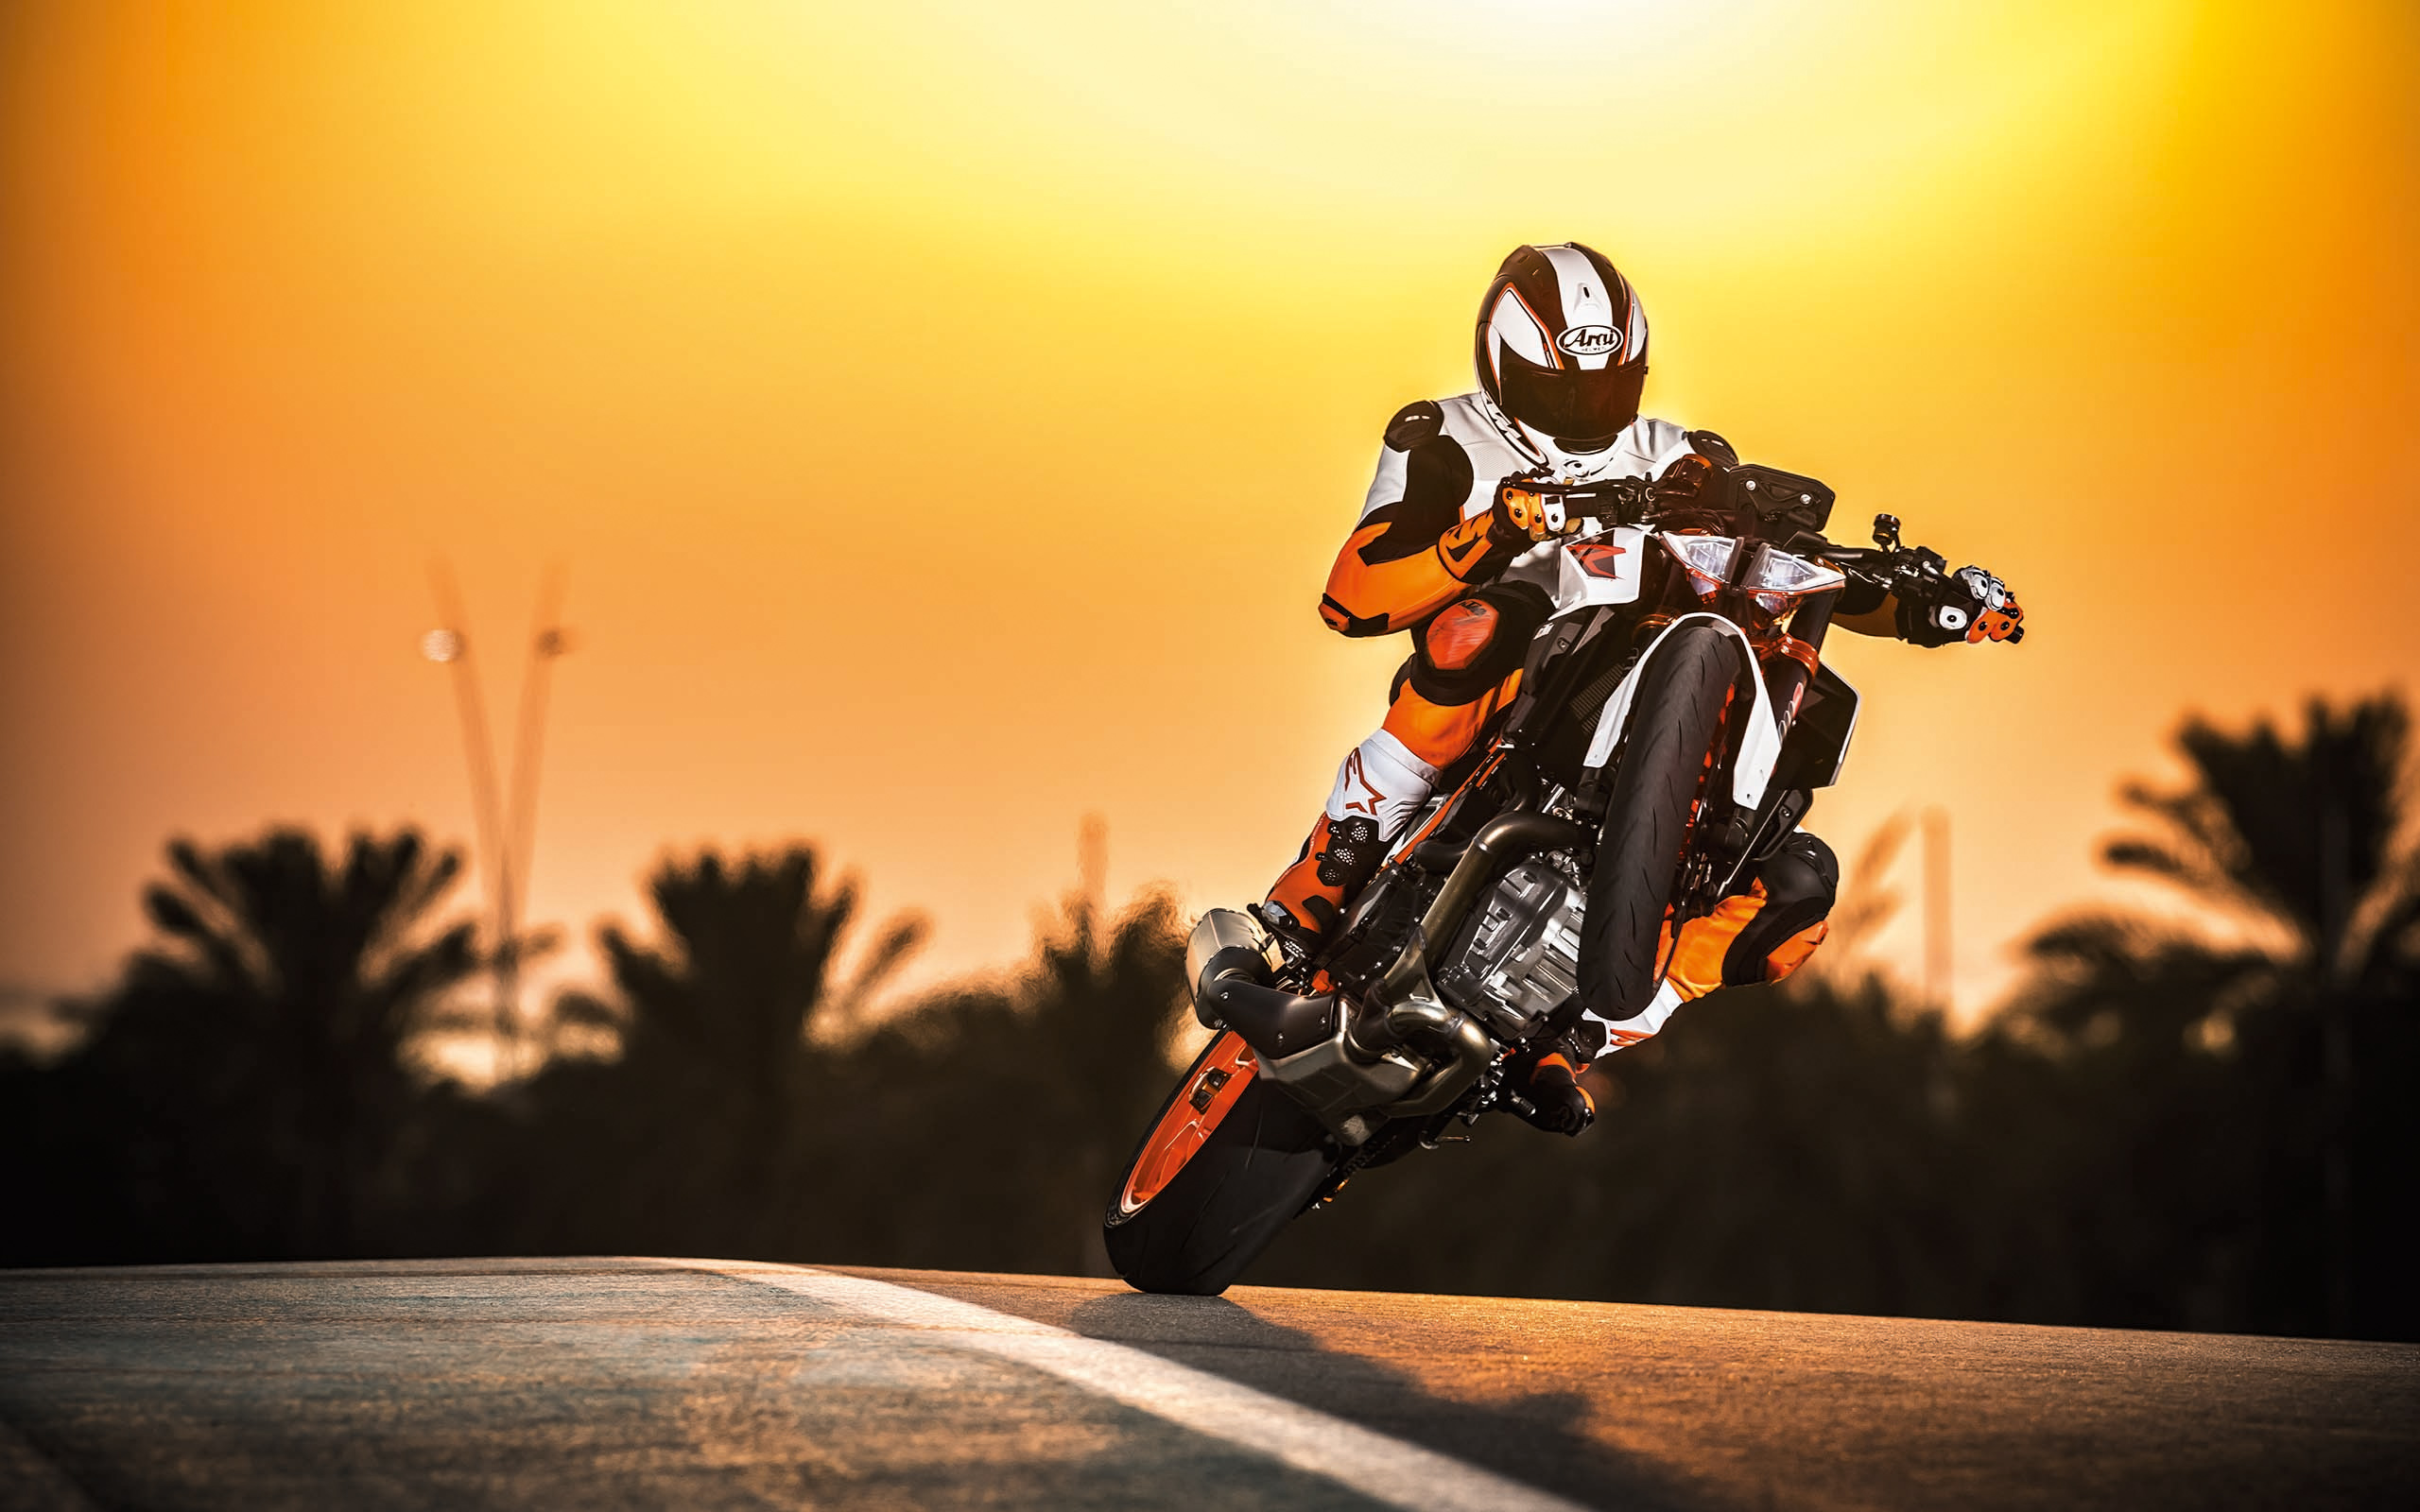 2017 KTM 1290 Super Duke R Stunt Wallpapers Wallpapers HD 2560x1600